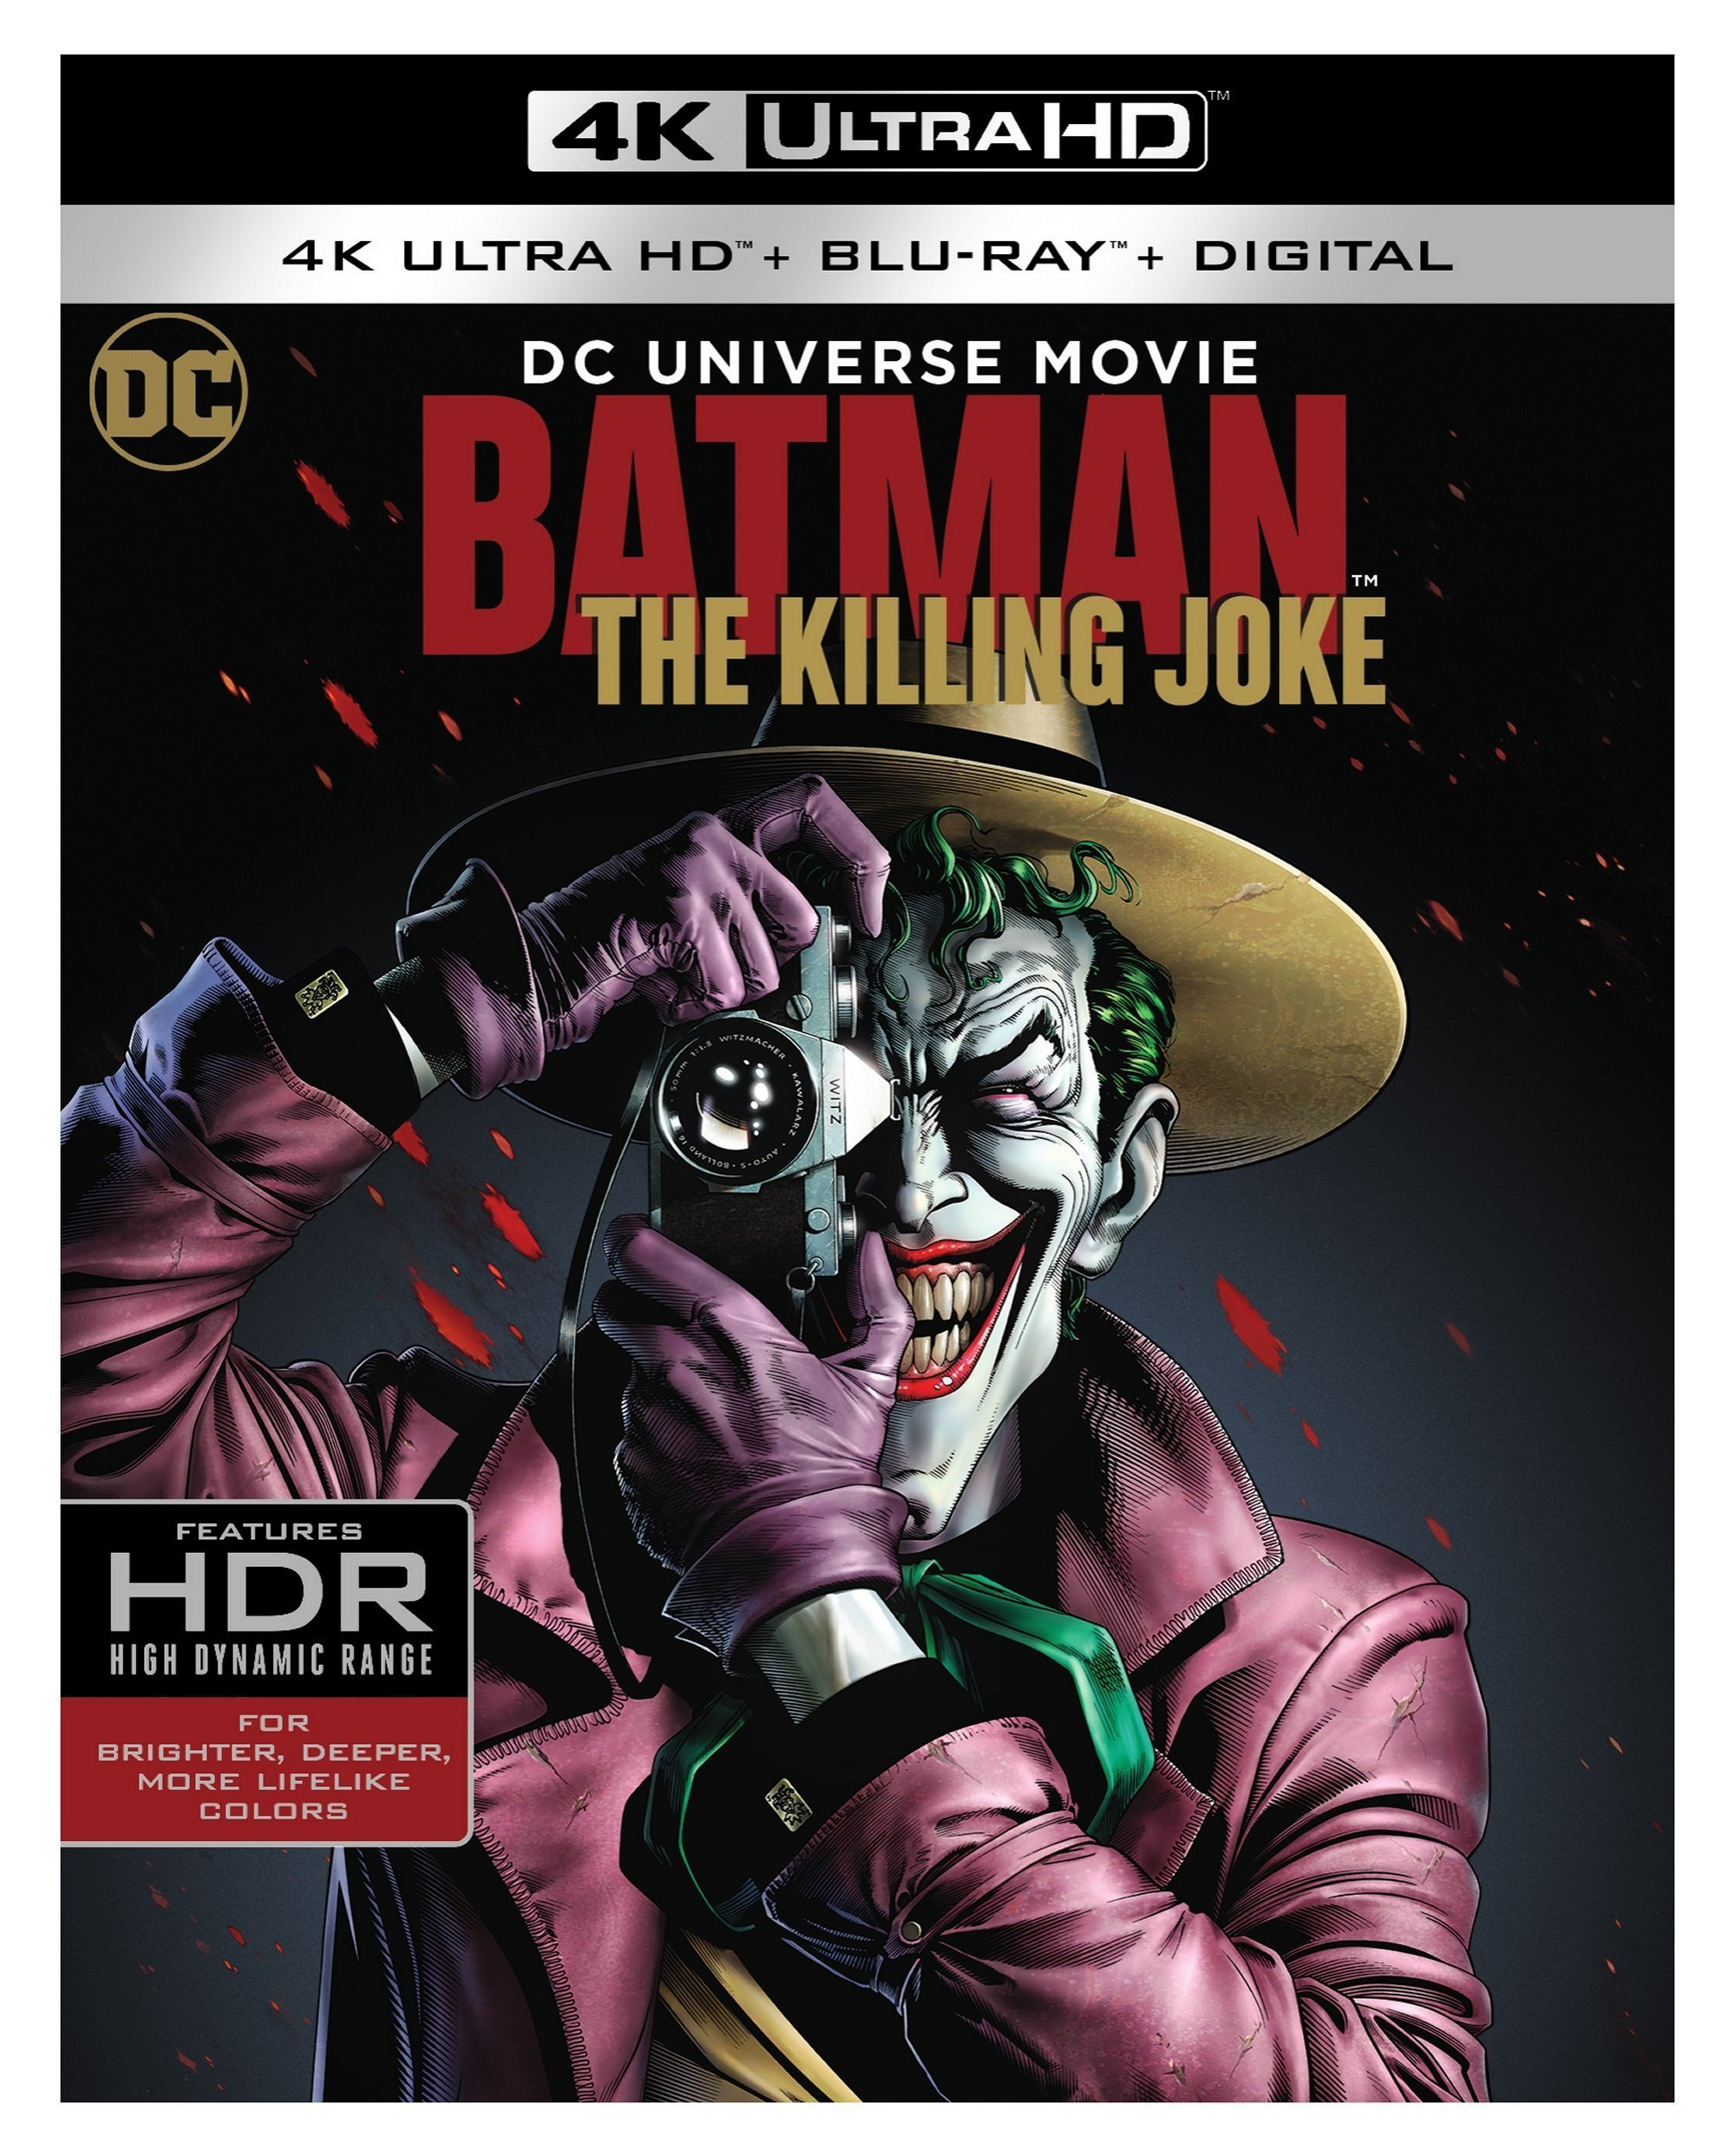 4K Blu-ray : Batman: The Killing Joke (Black, With Blu-ray, 4K Mastering, 2 Pack, Digital Copy)